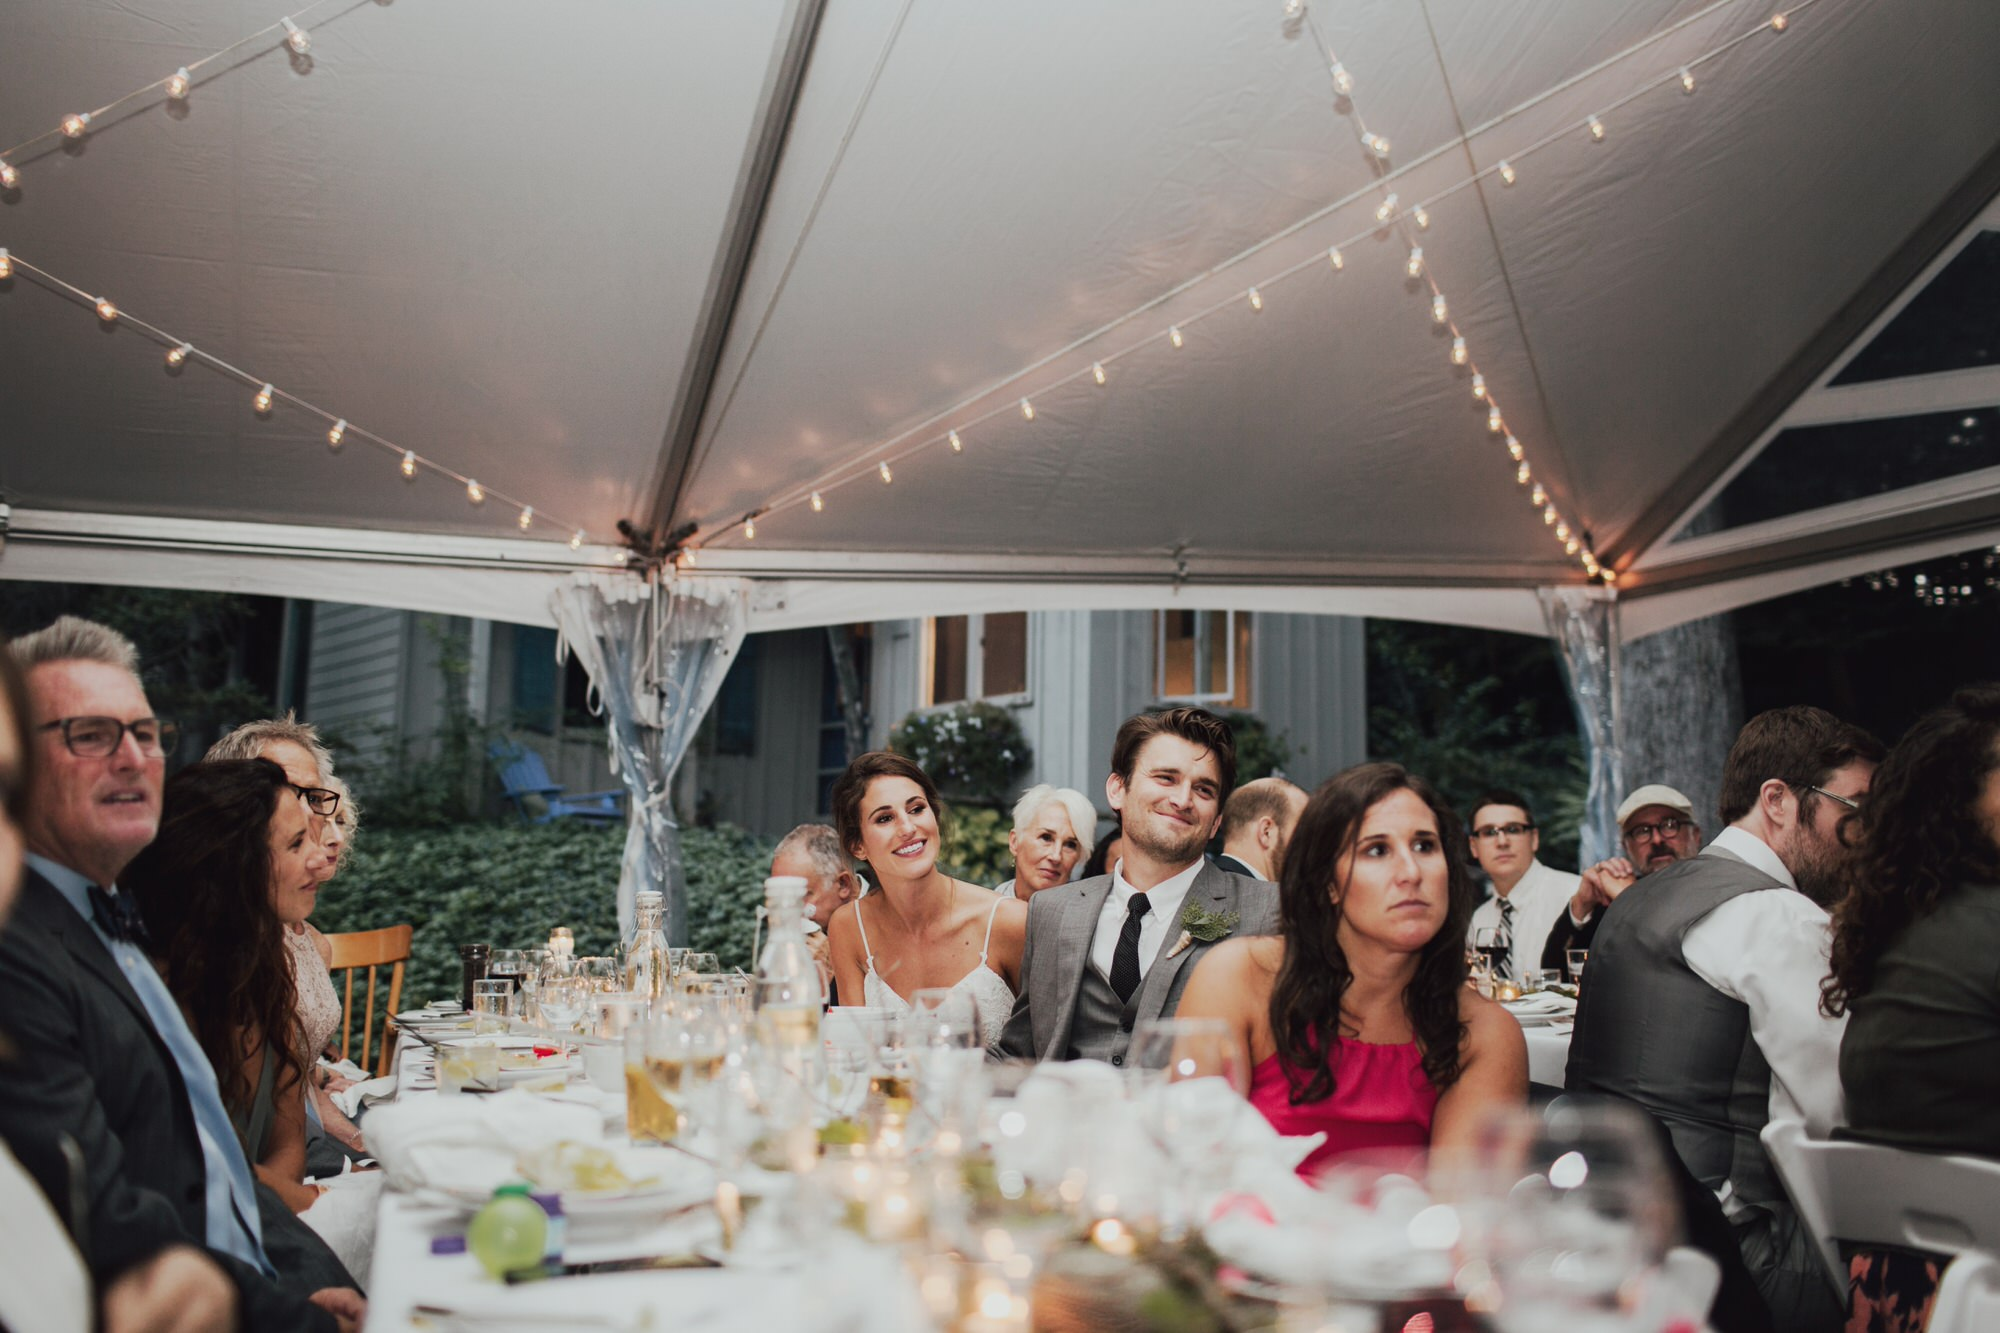 emily-aaron-rochester-new-york-wedding-photographer-113.JPG